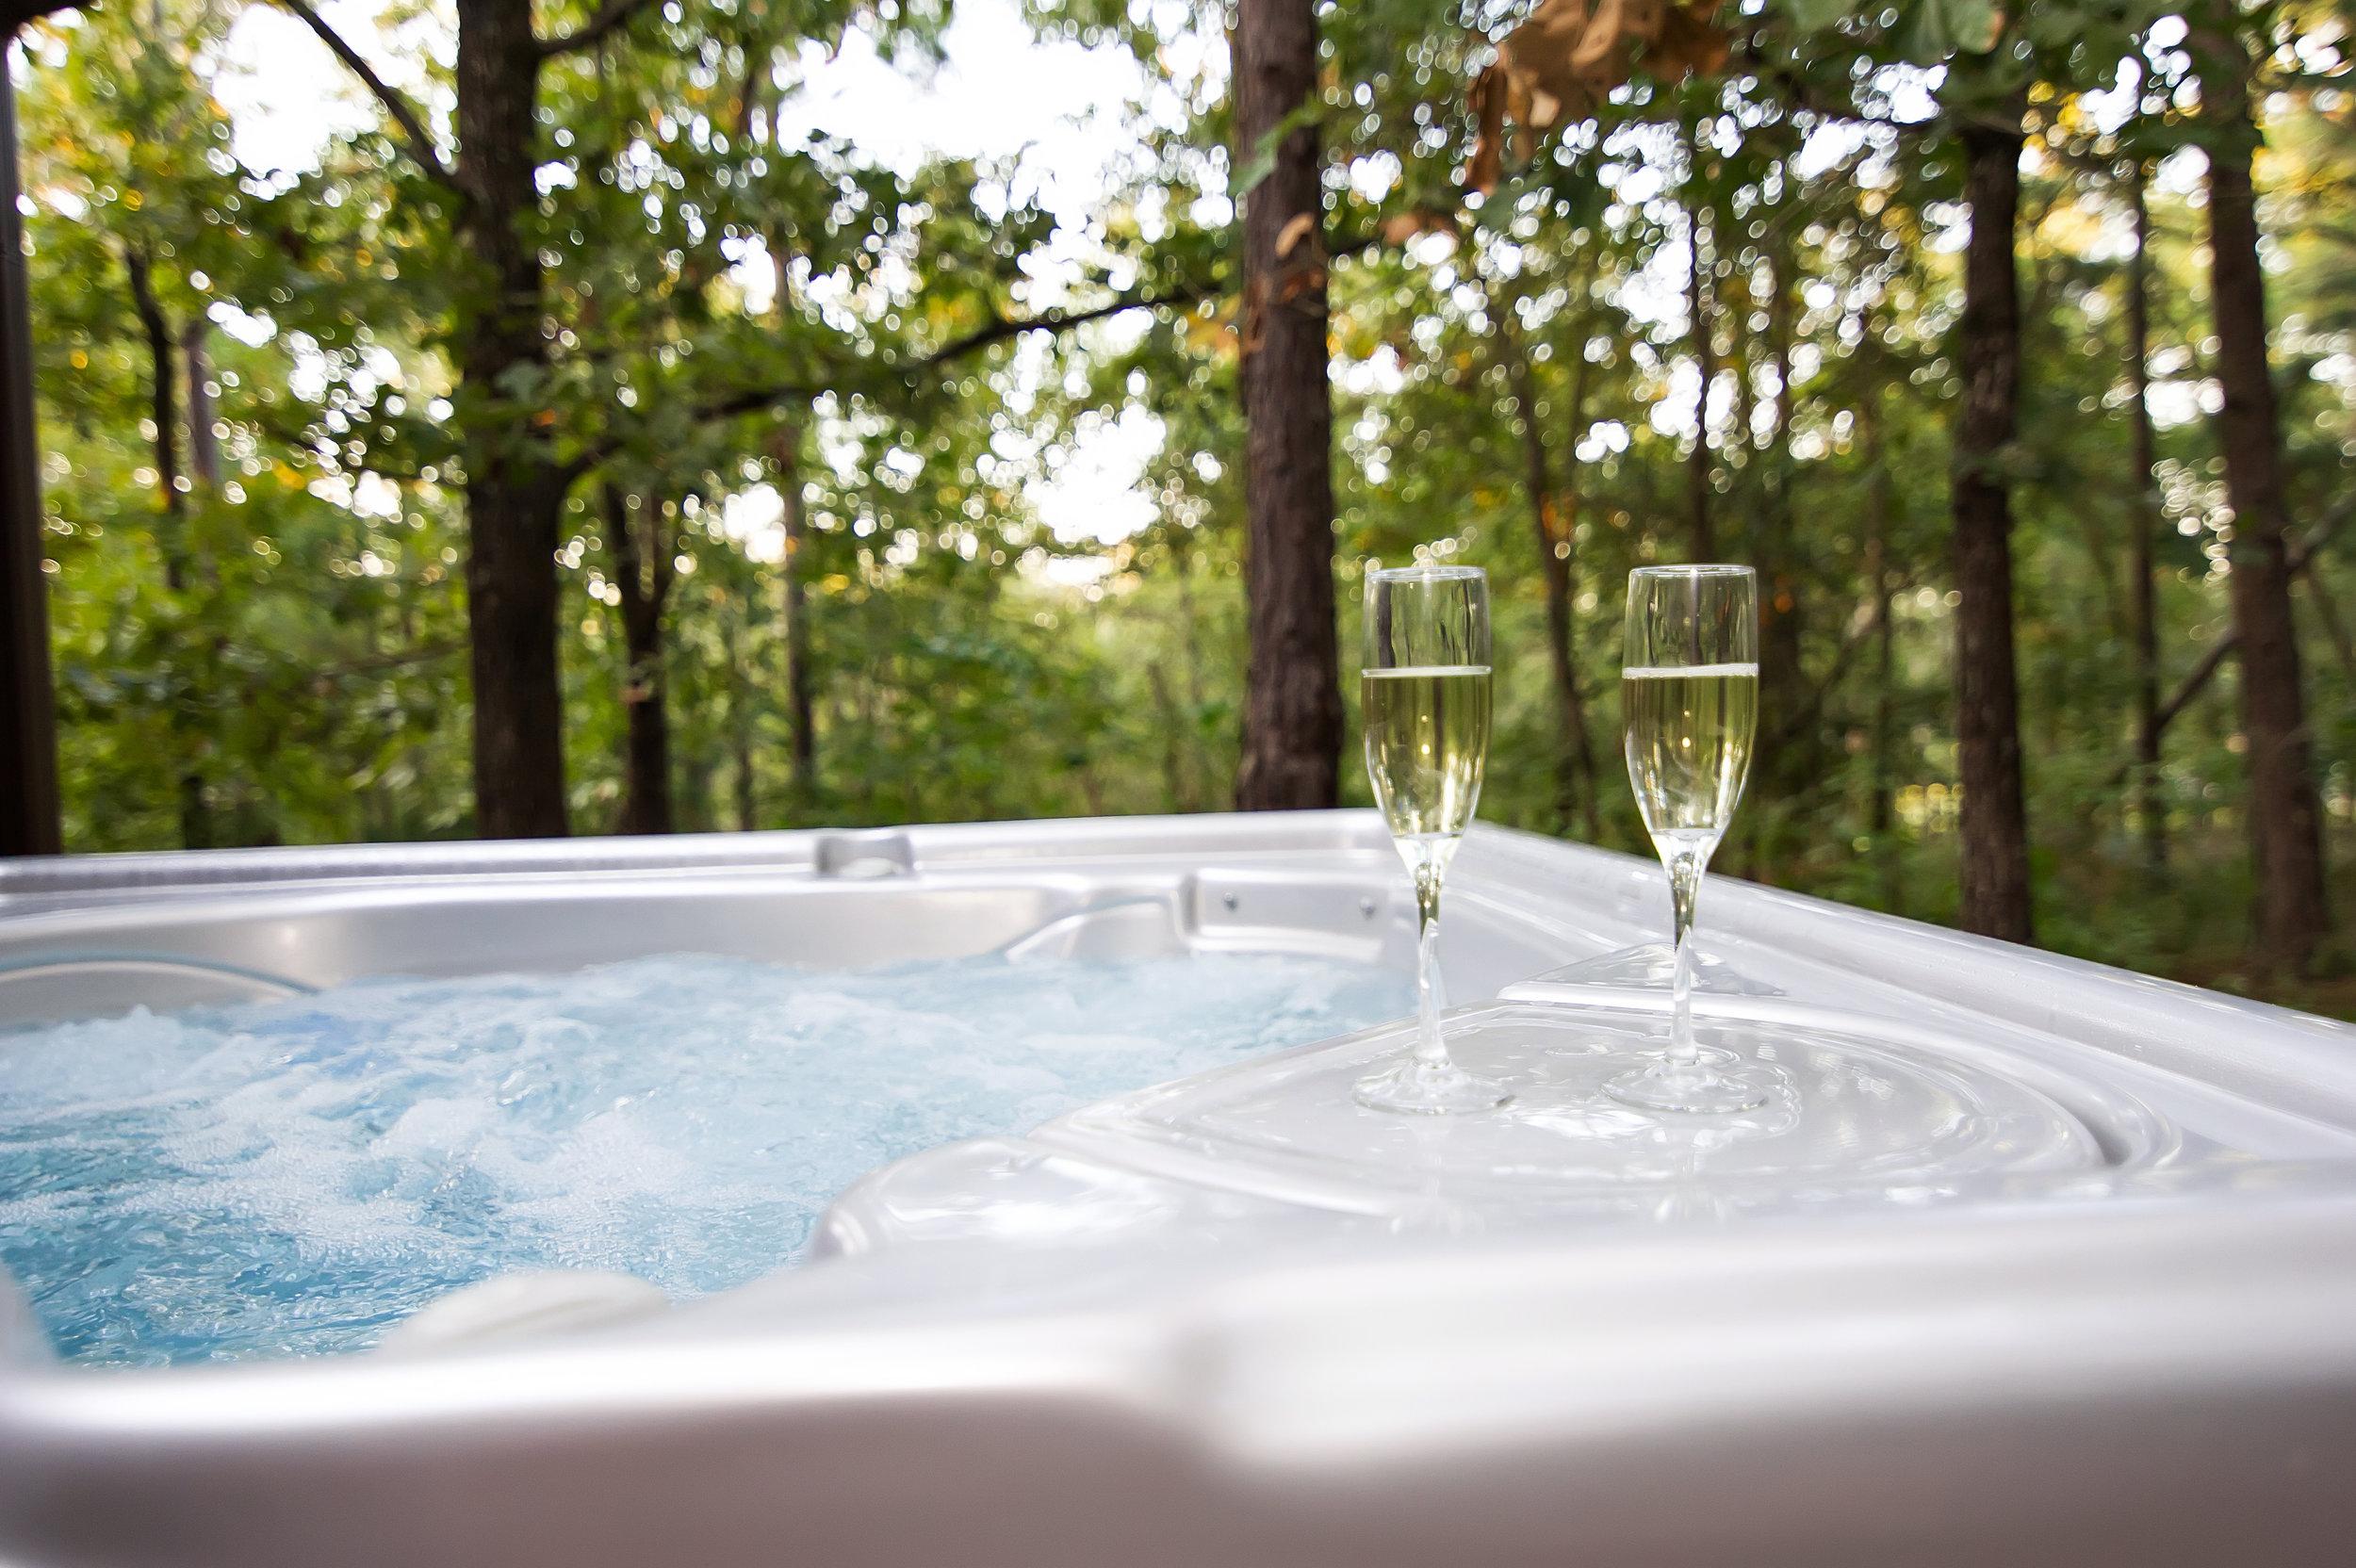 Hot tub - Wine glasses.jpg.jpg